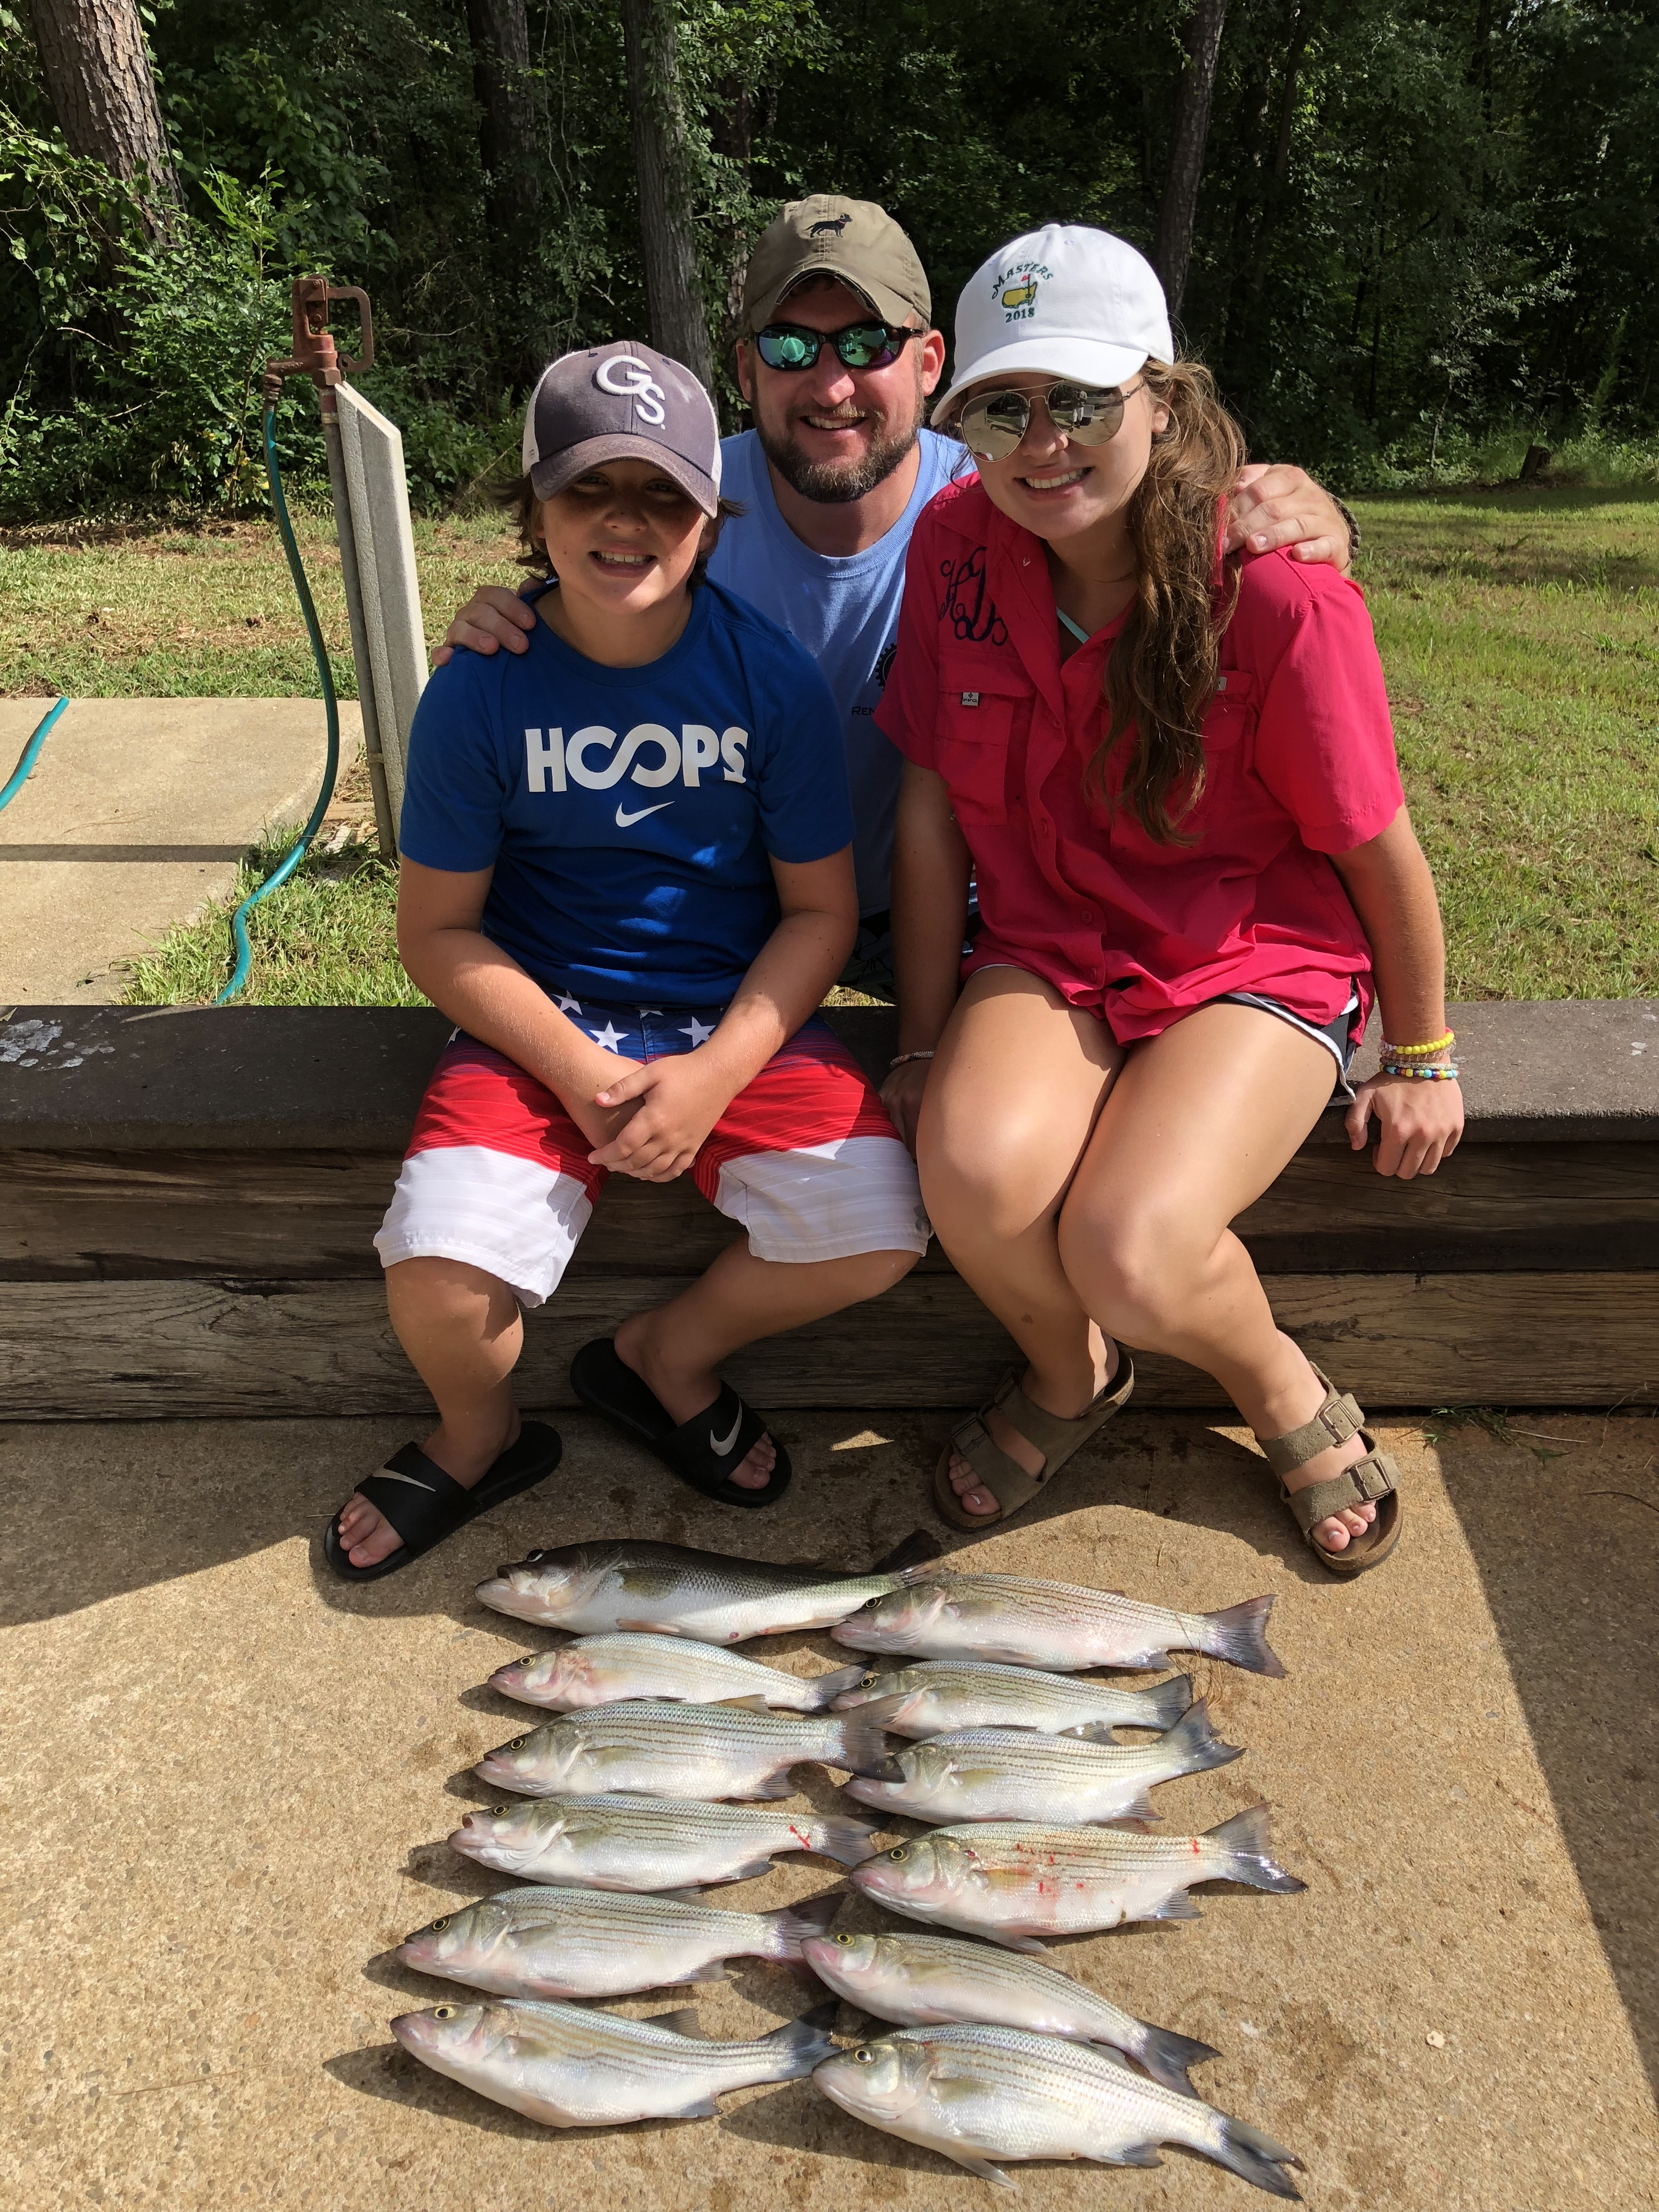 July 5, 2018 Chris, Haylee and Kase Dye from Statesboro, Ga.IMG_2248